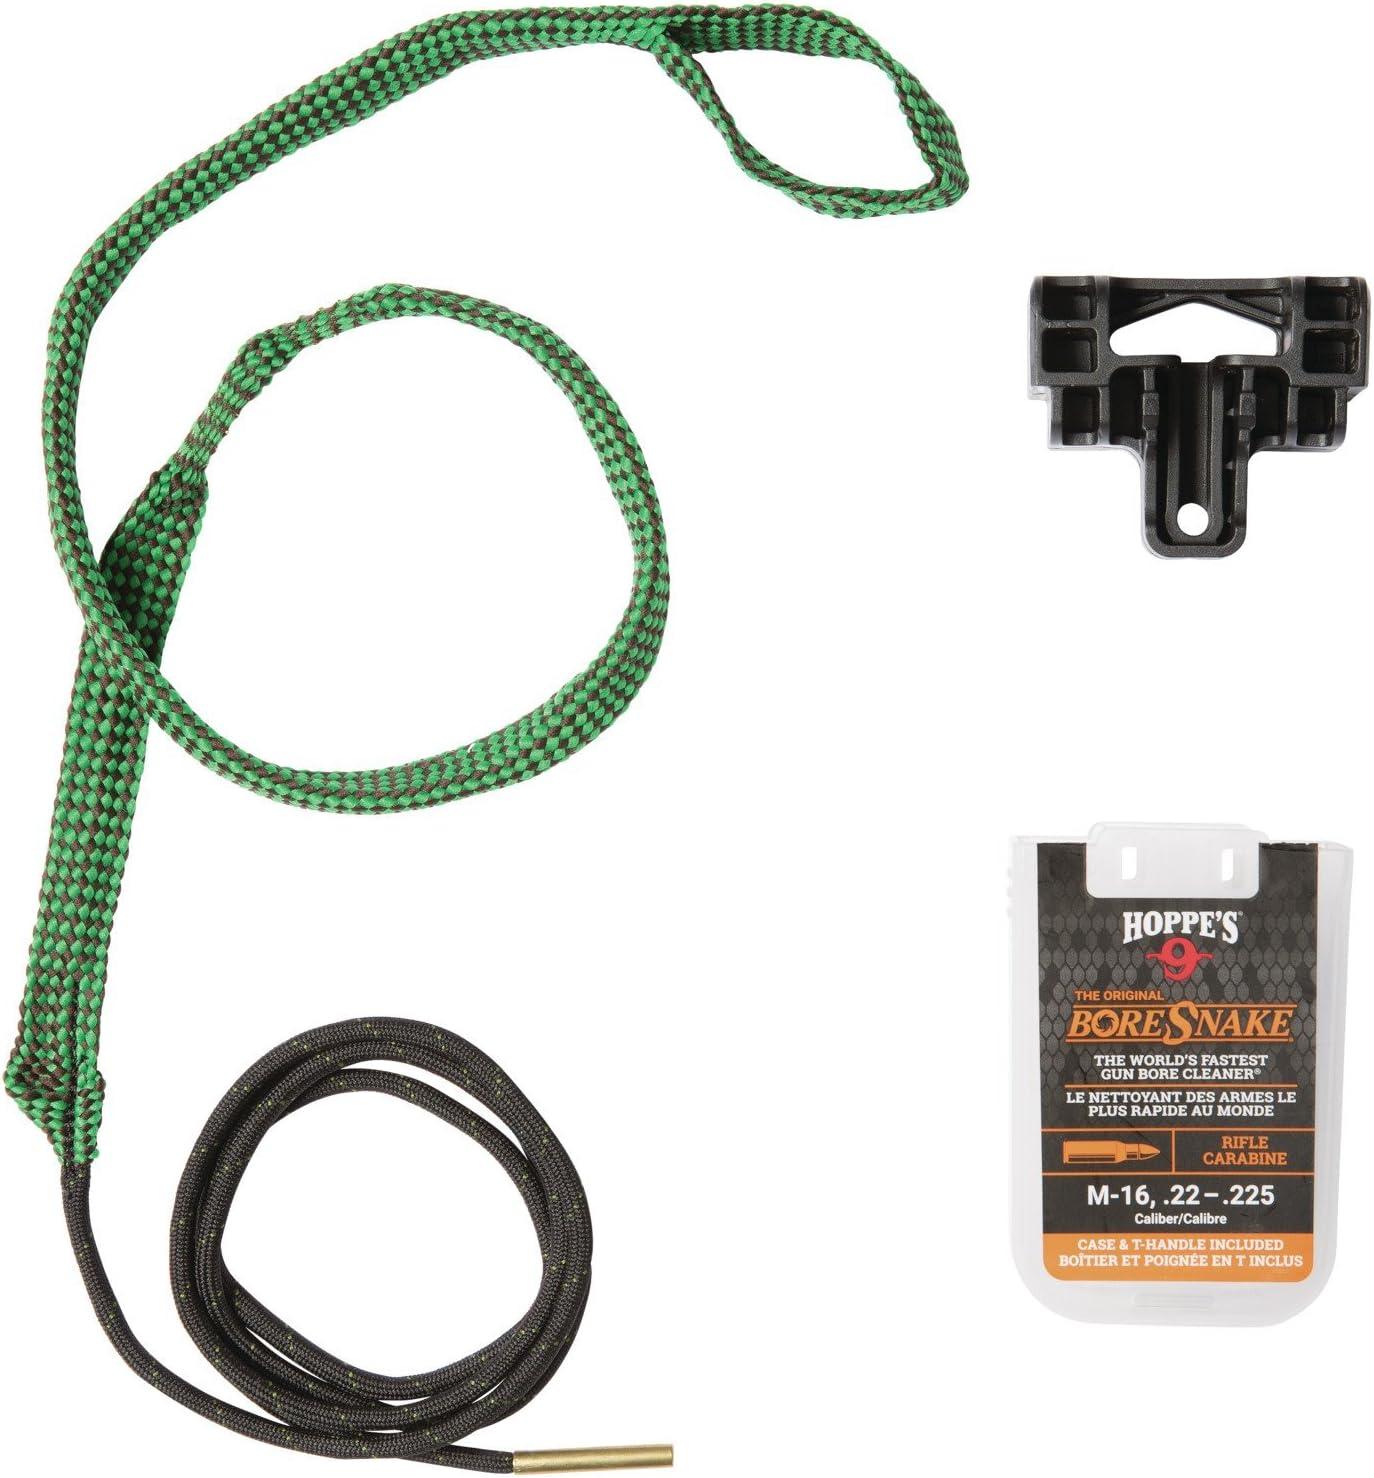 Amazon.com : Hoppe's 24011D Boresnake : Sports & Outdoors